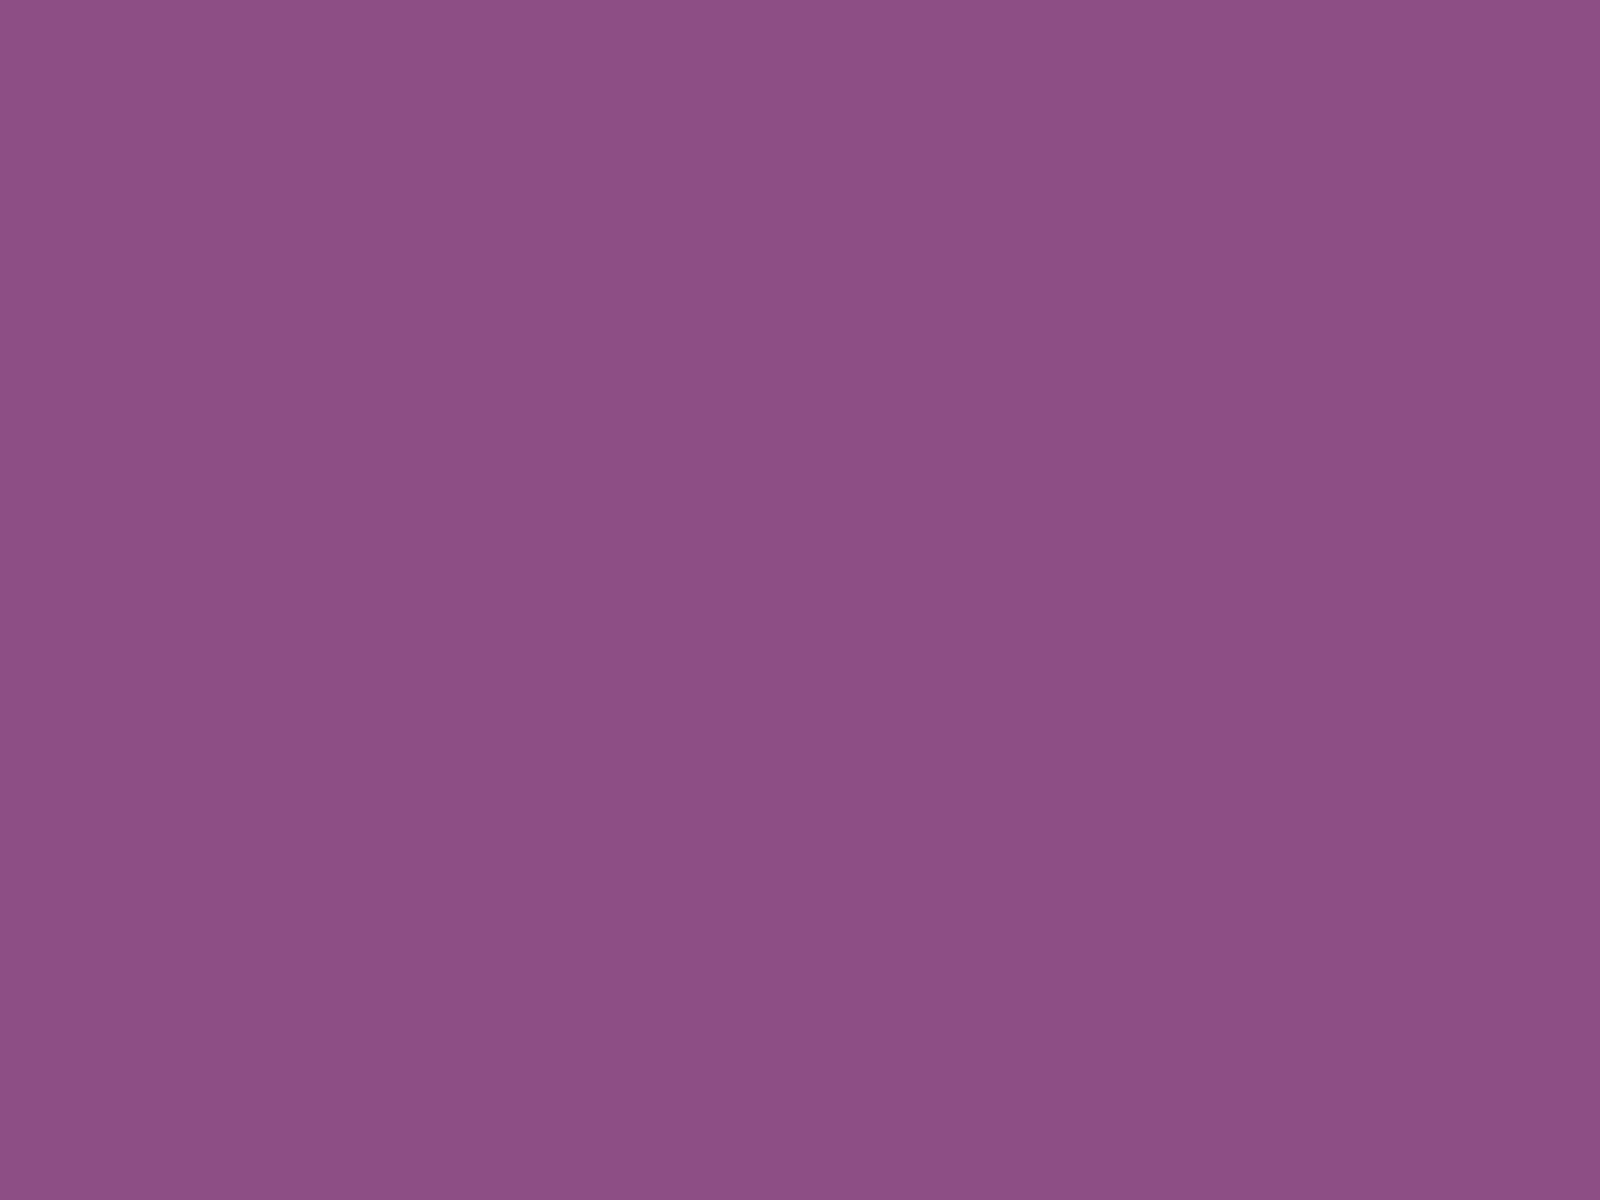 1600x1200 Razzmic Berry Solid Color Background